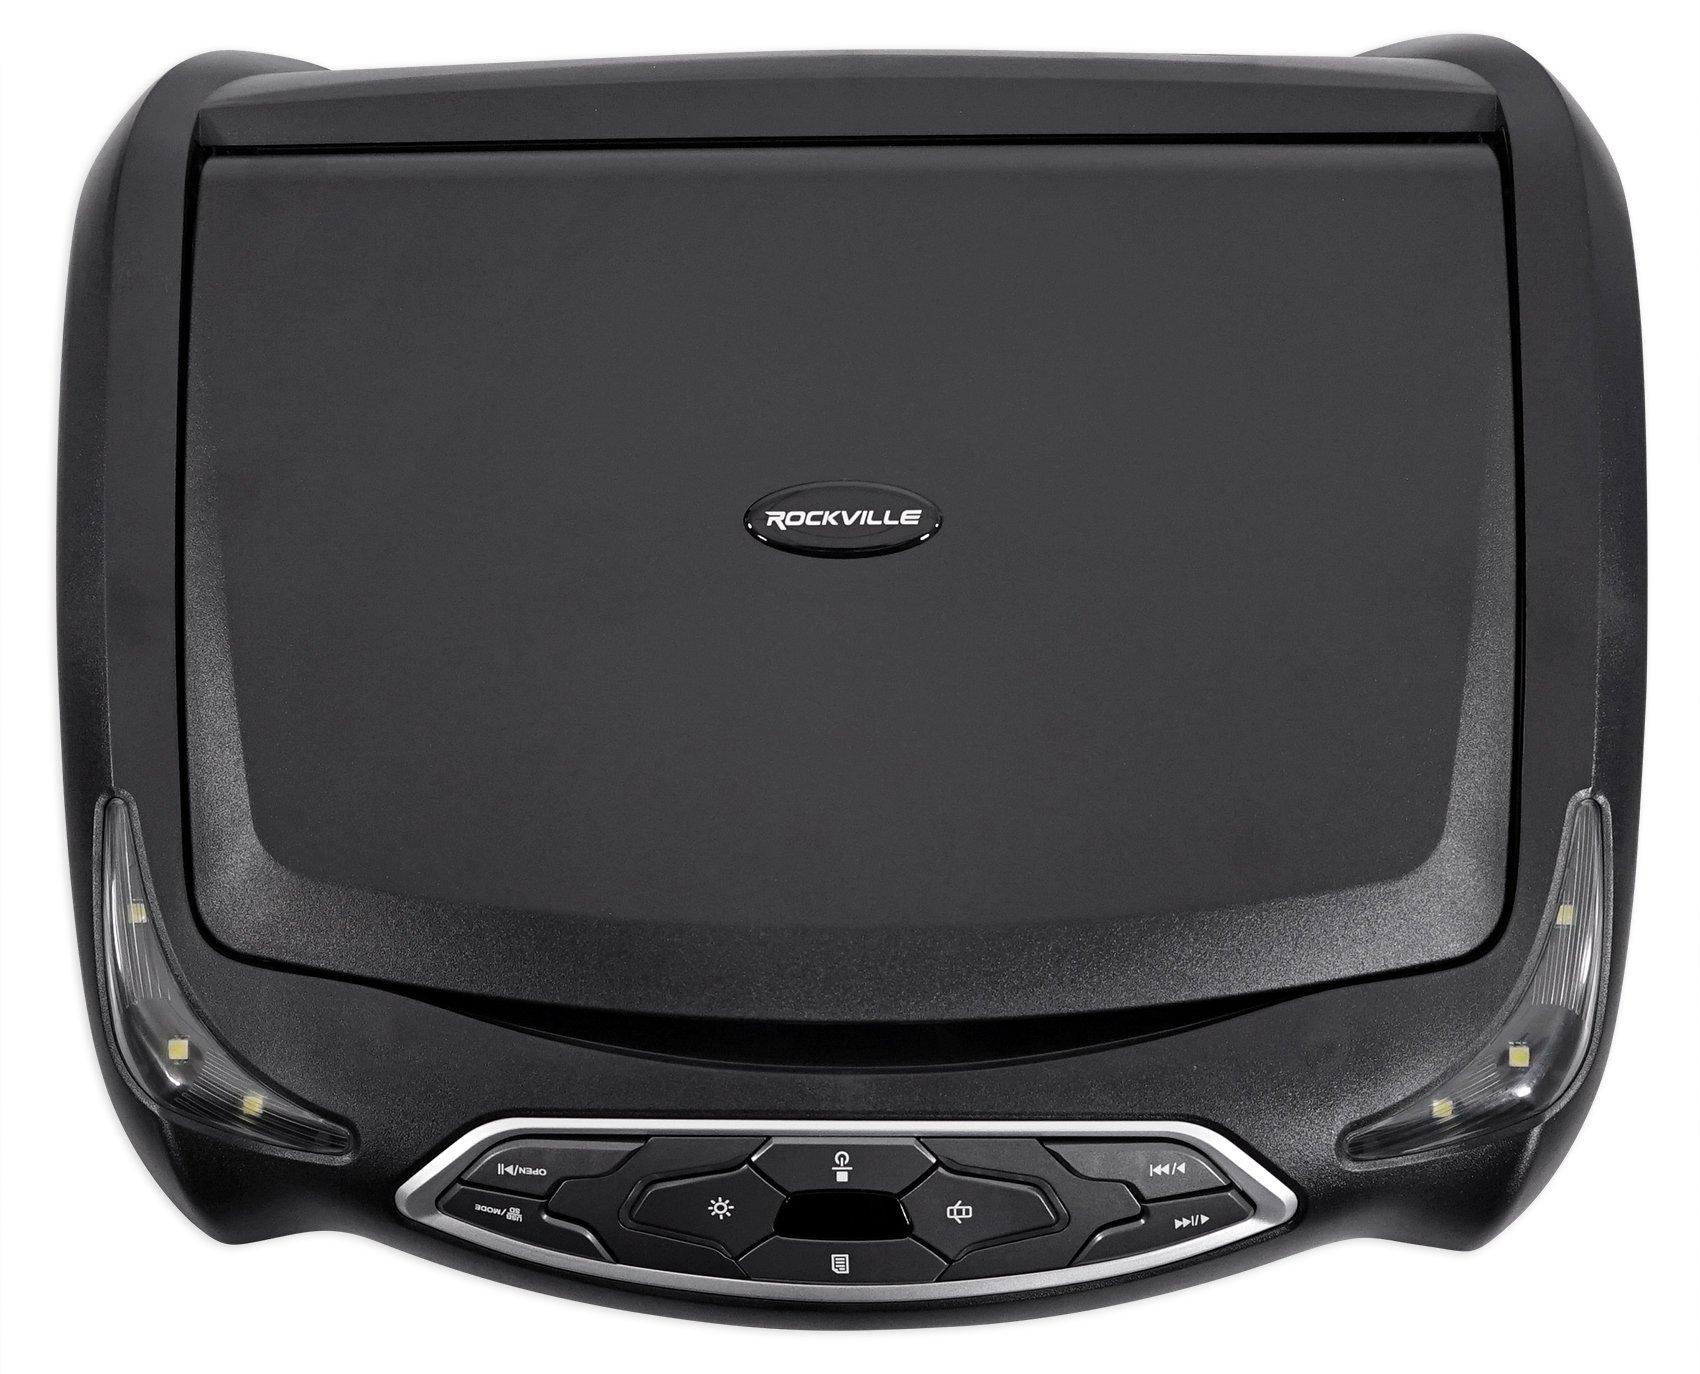 Rockville RVD14BGB Black/Grey/Tan 14'' Flip Down Car DVD Monitor+Games+Headphones by Rockville (Image #2)